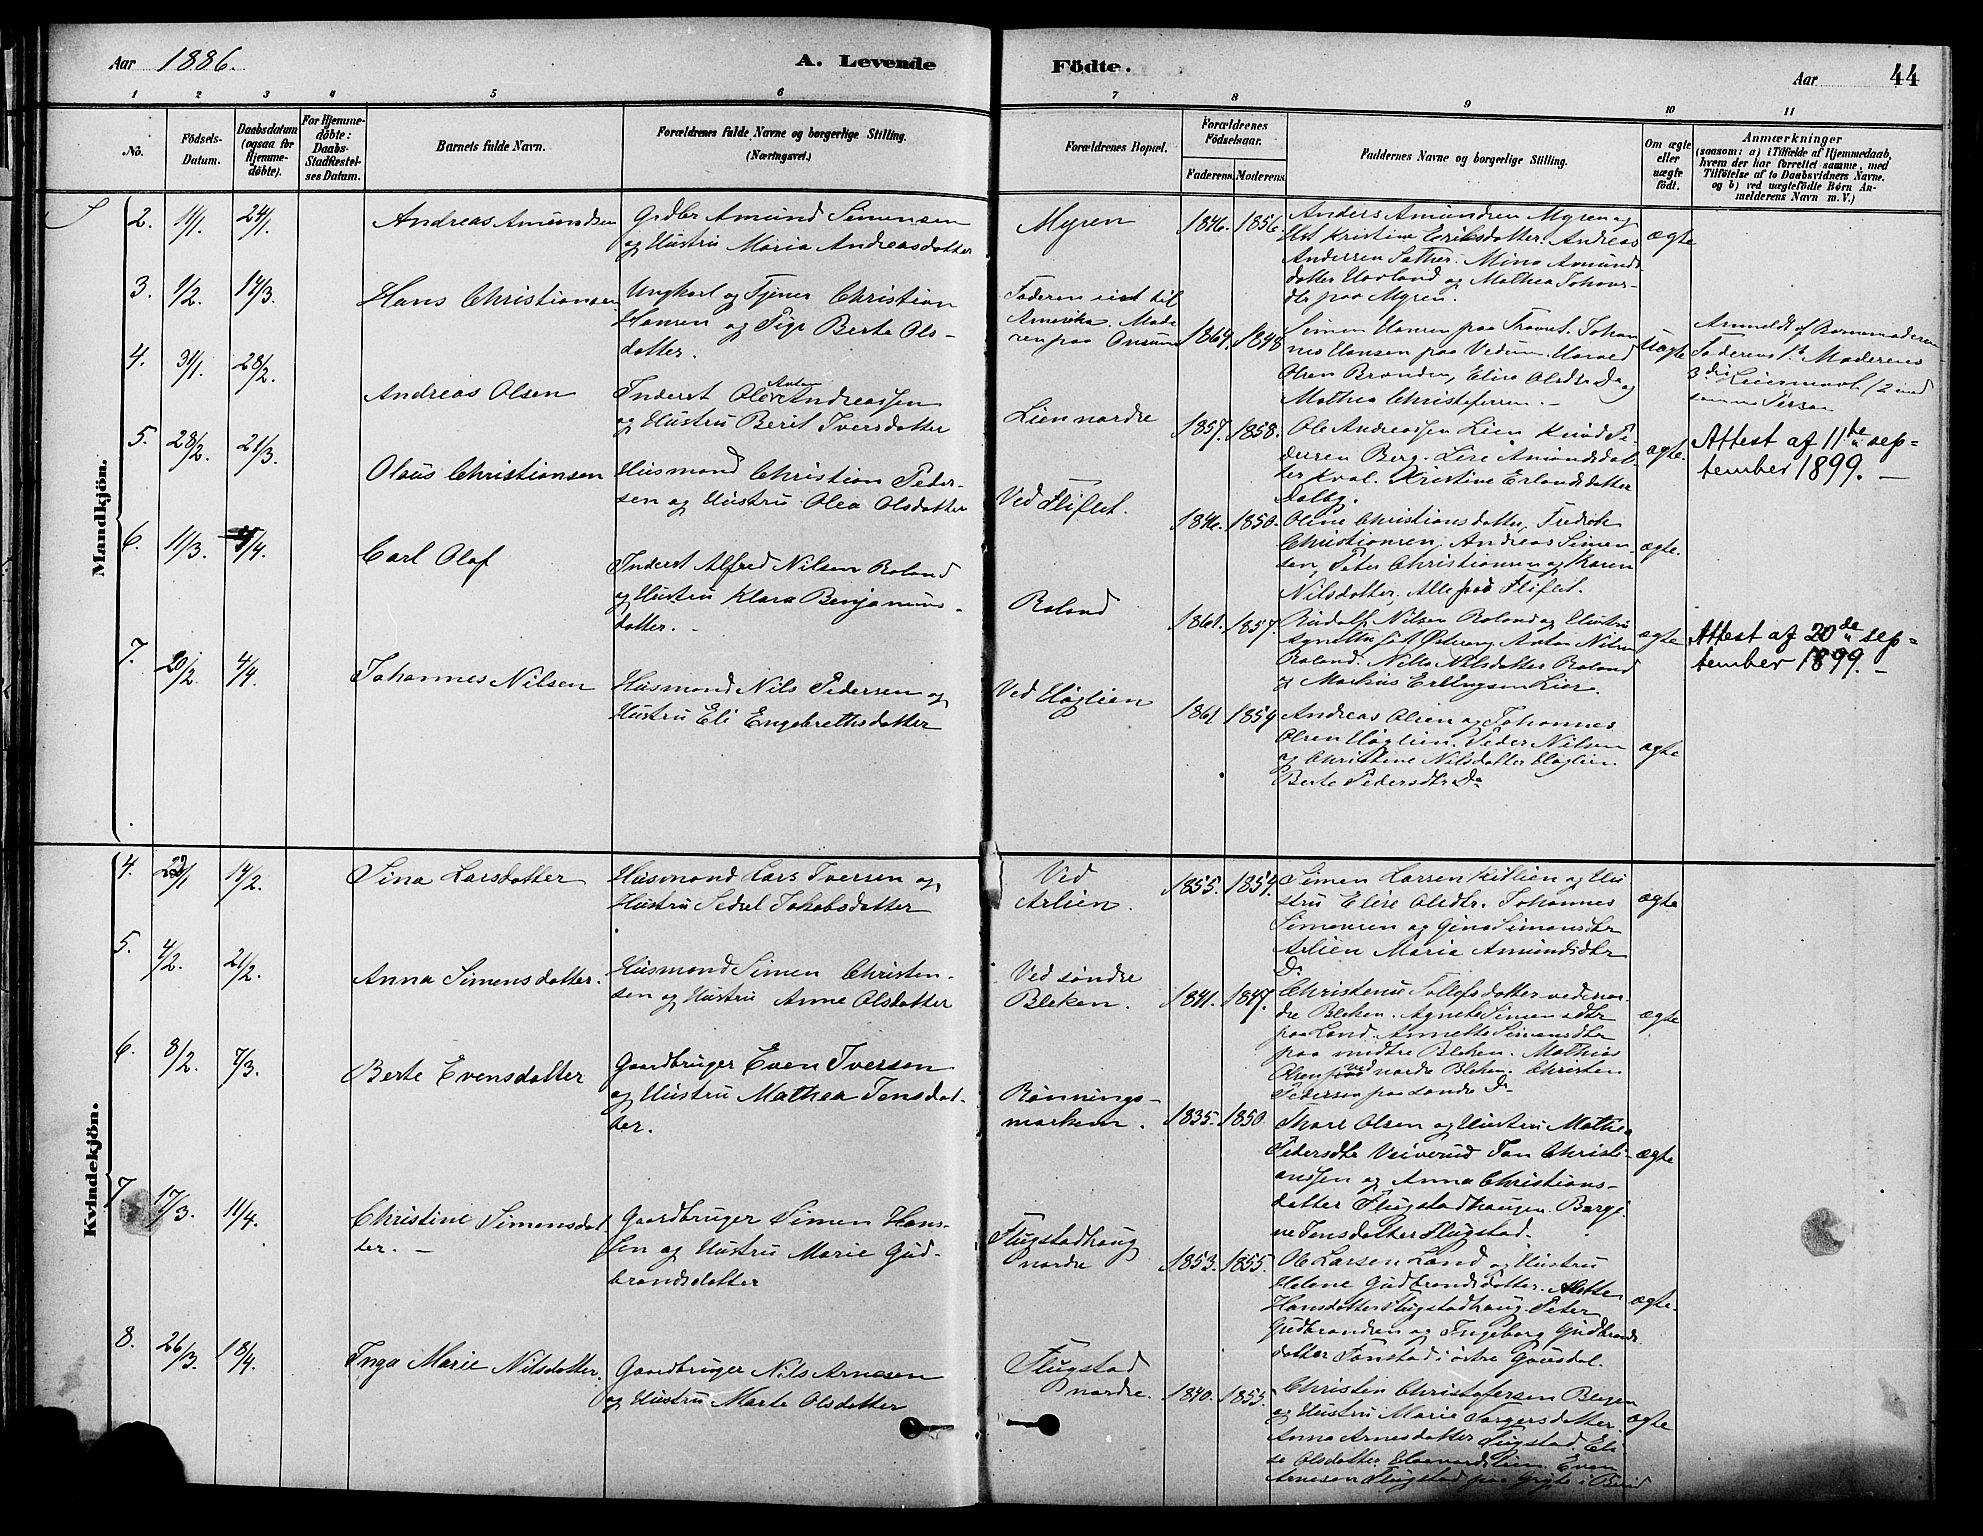 SAH, Fåberg prestekontor, H/Ha/Haa/L0008: Ministerialbok nr. 8, 1879-1898, s. 44